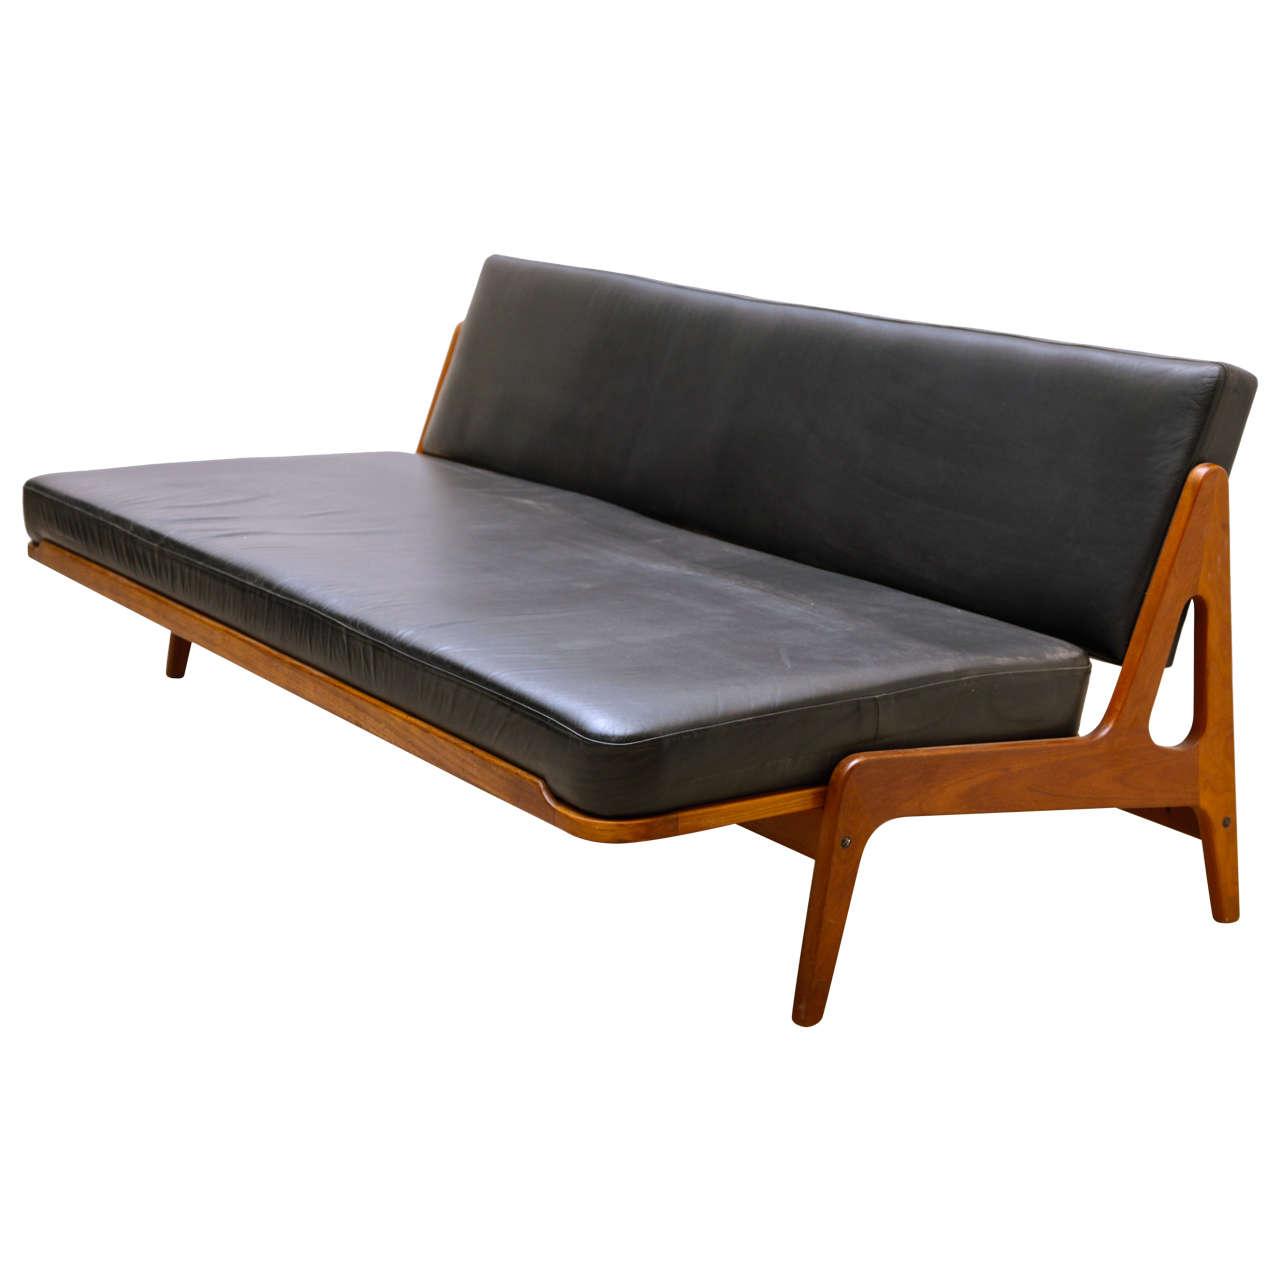 Arne Wahl Iversen By Komfort Teak Sofa And Daybed At 1stdibs